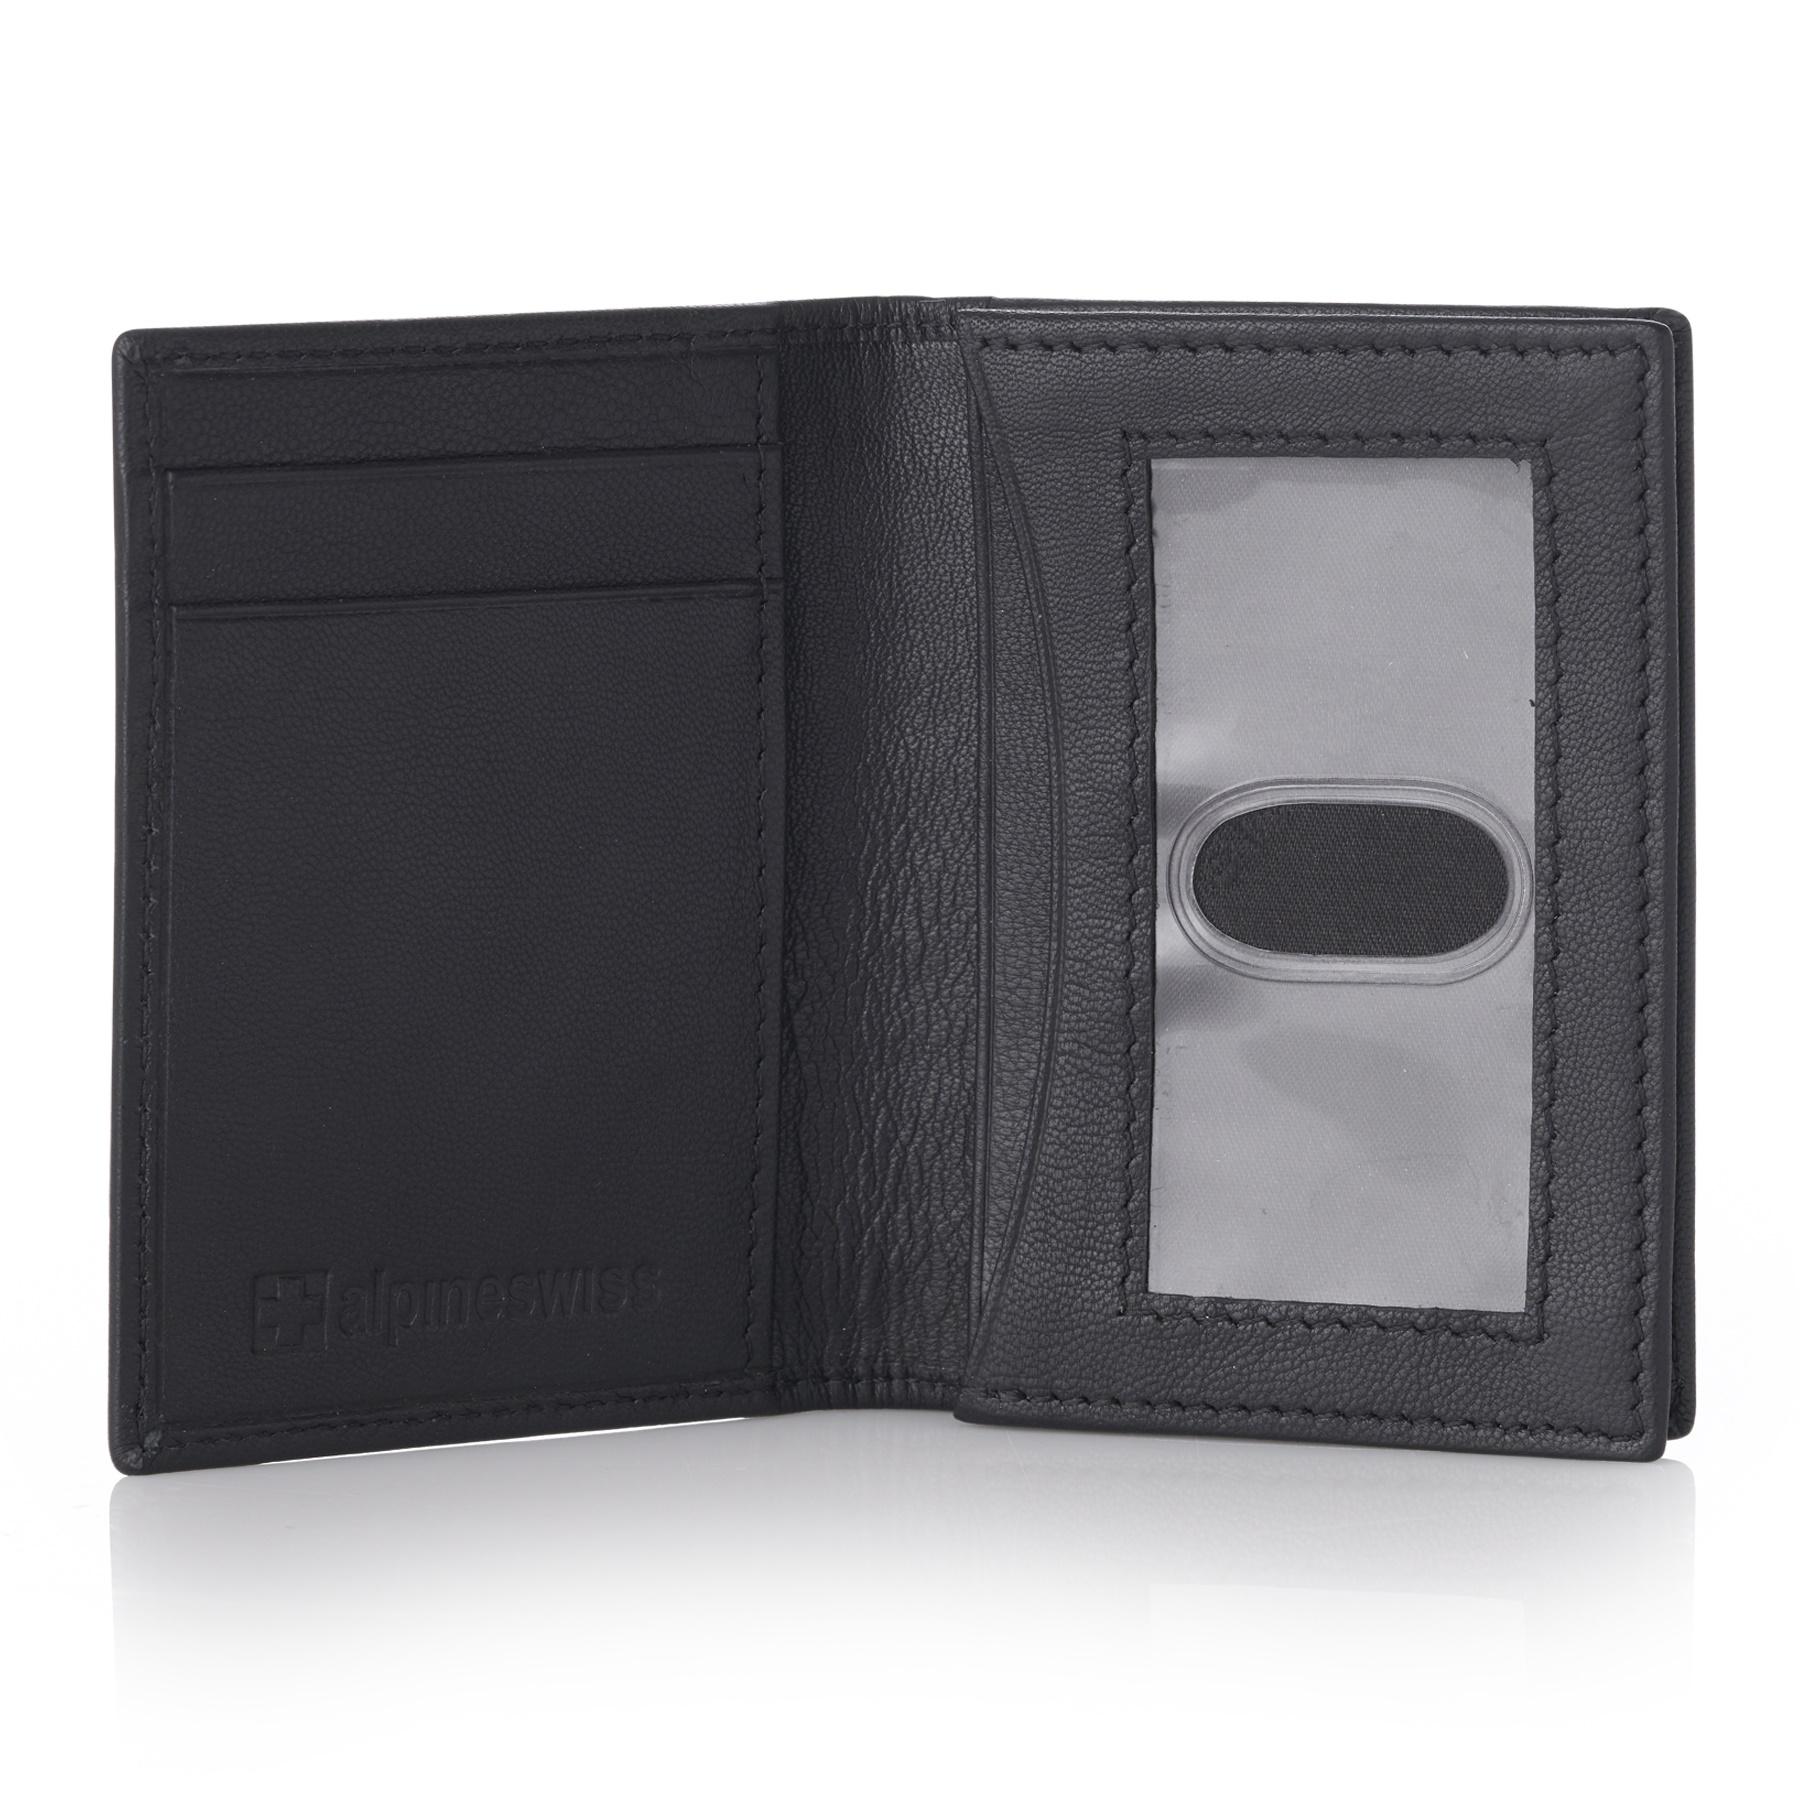 Alpine-Swiss-RFID-Leather-Business-Card-Wallet-Minimalist-ID-Window-Card-Holder thumbnail 18